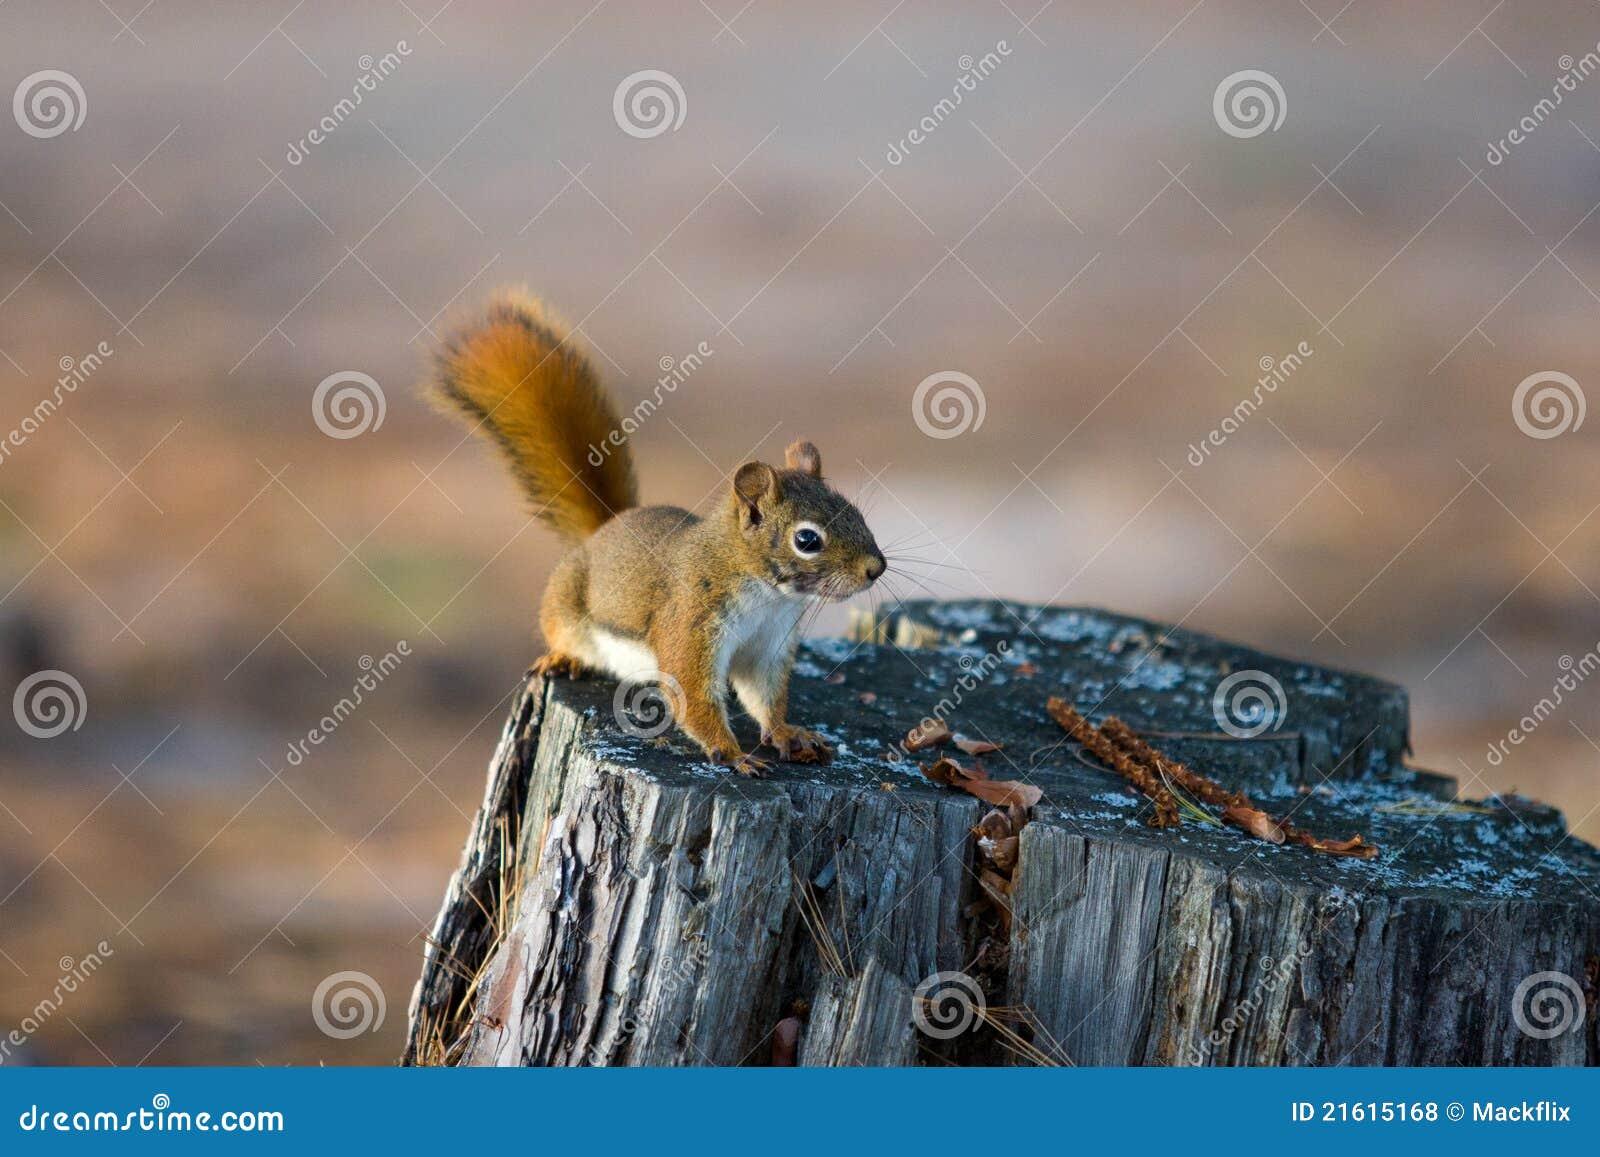 Alert Red Squirrel on Tree Stump